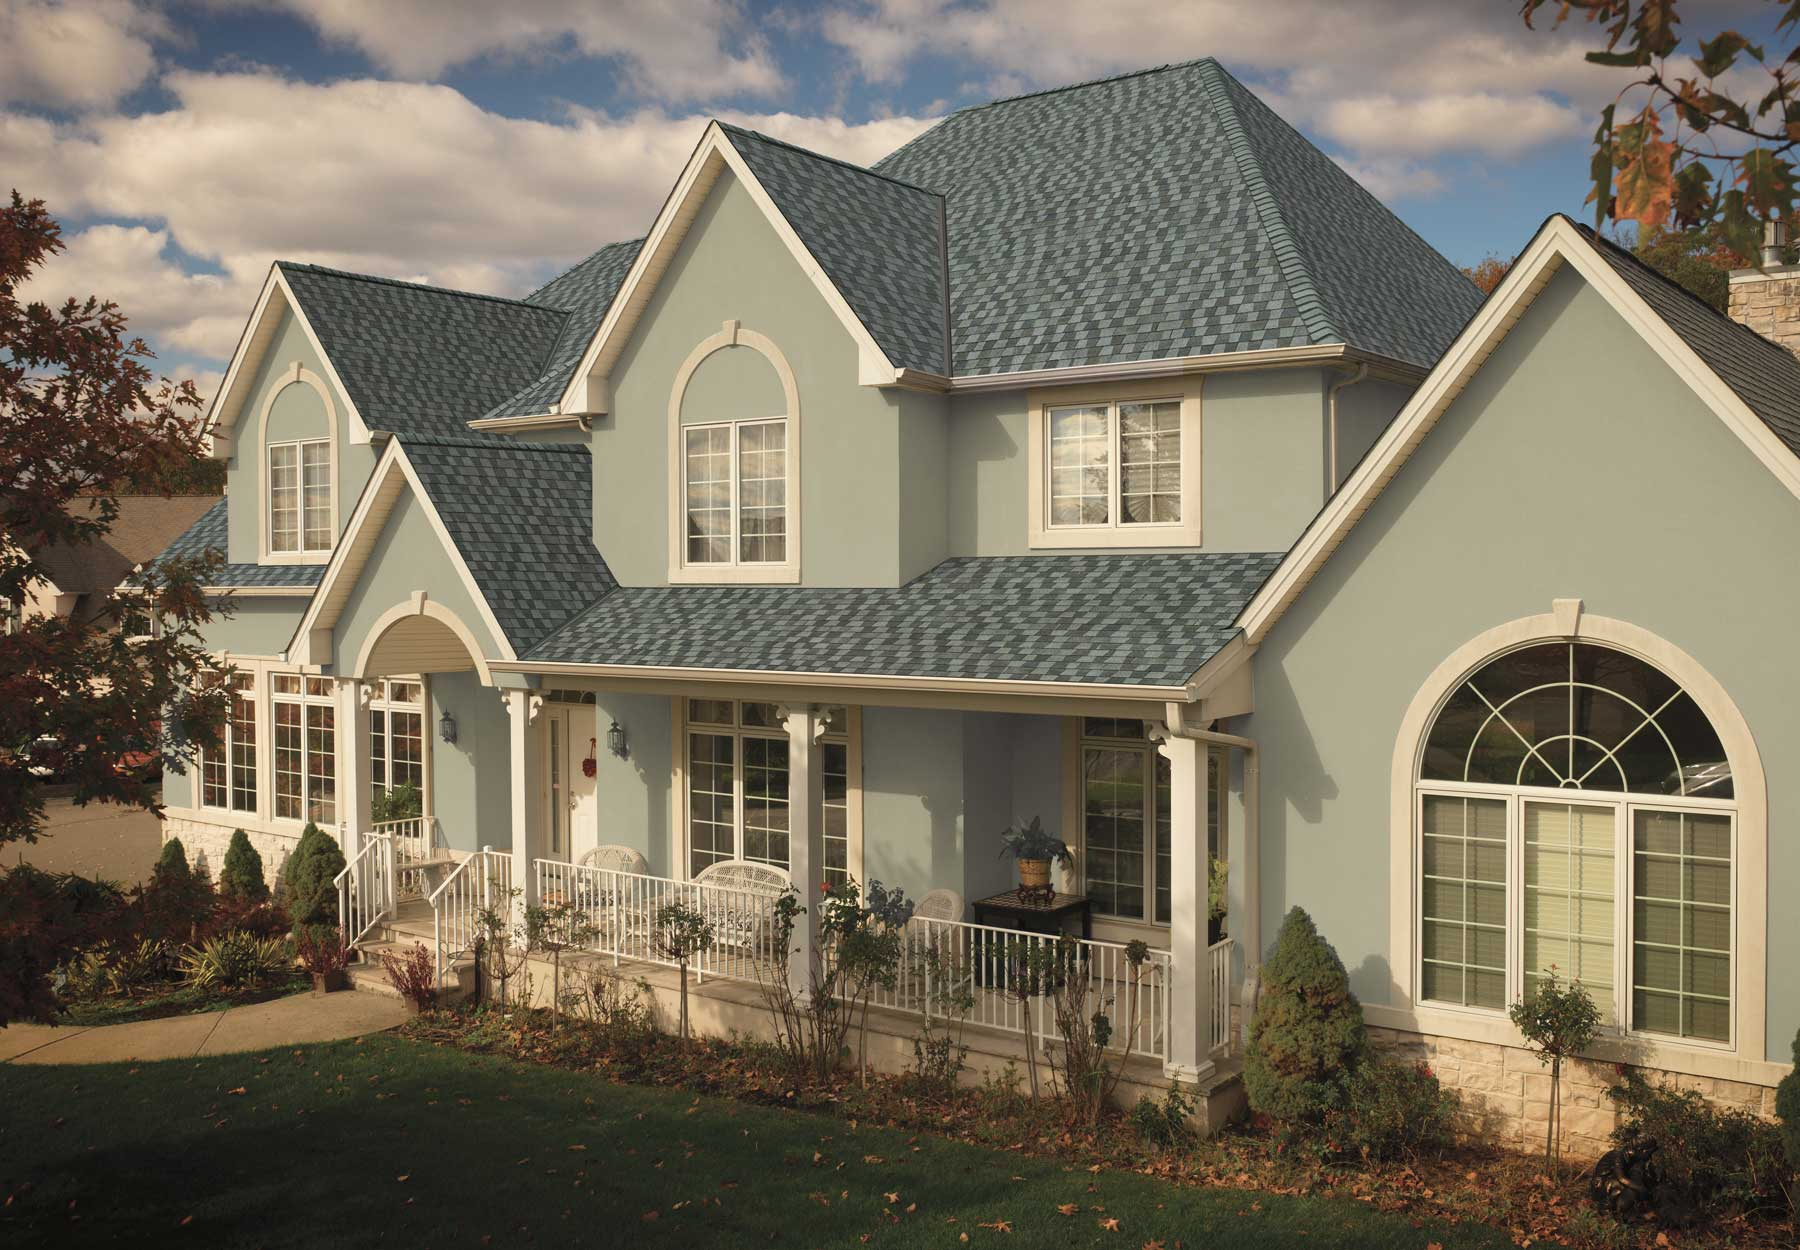 GAF-Architectural-Shingles-Timberline-American-Harvest-Nantucket-Morning-Home.jpg